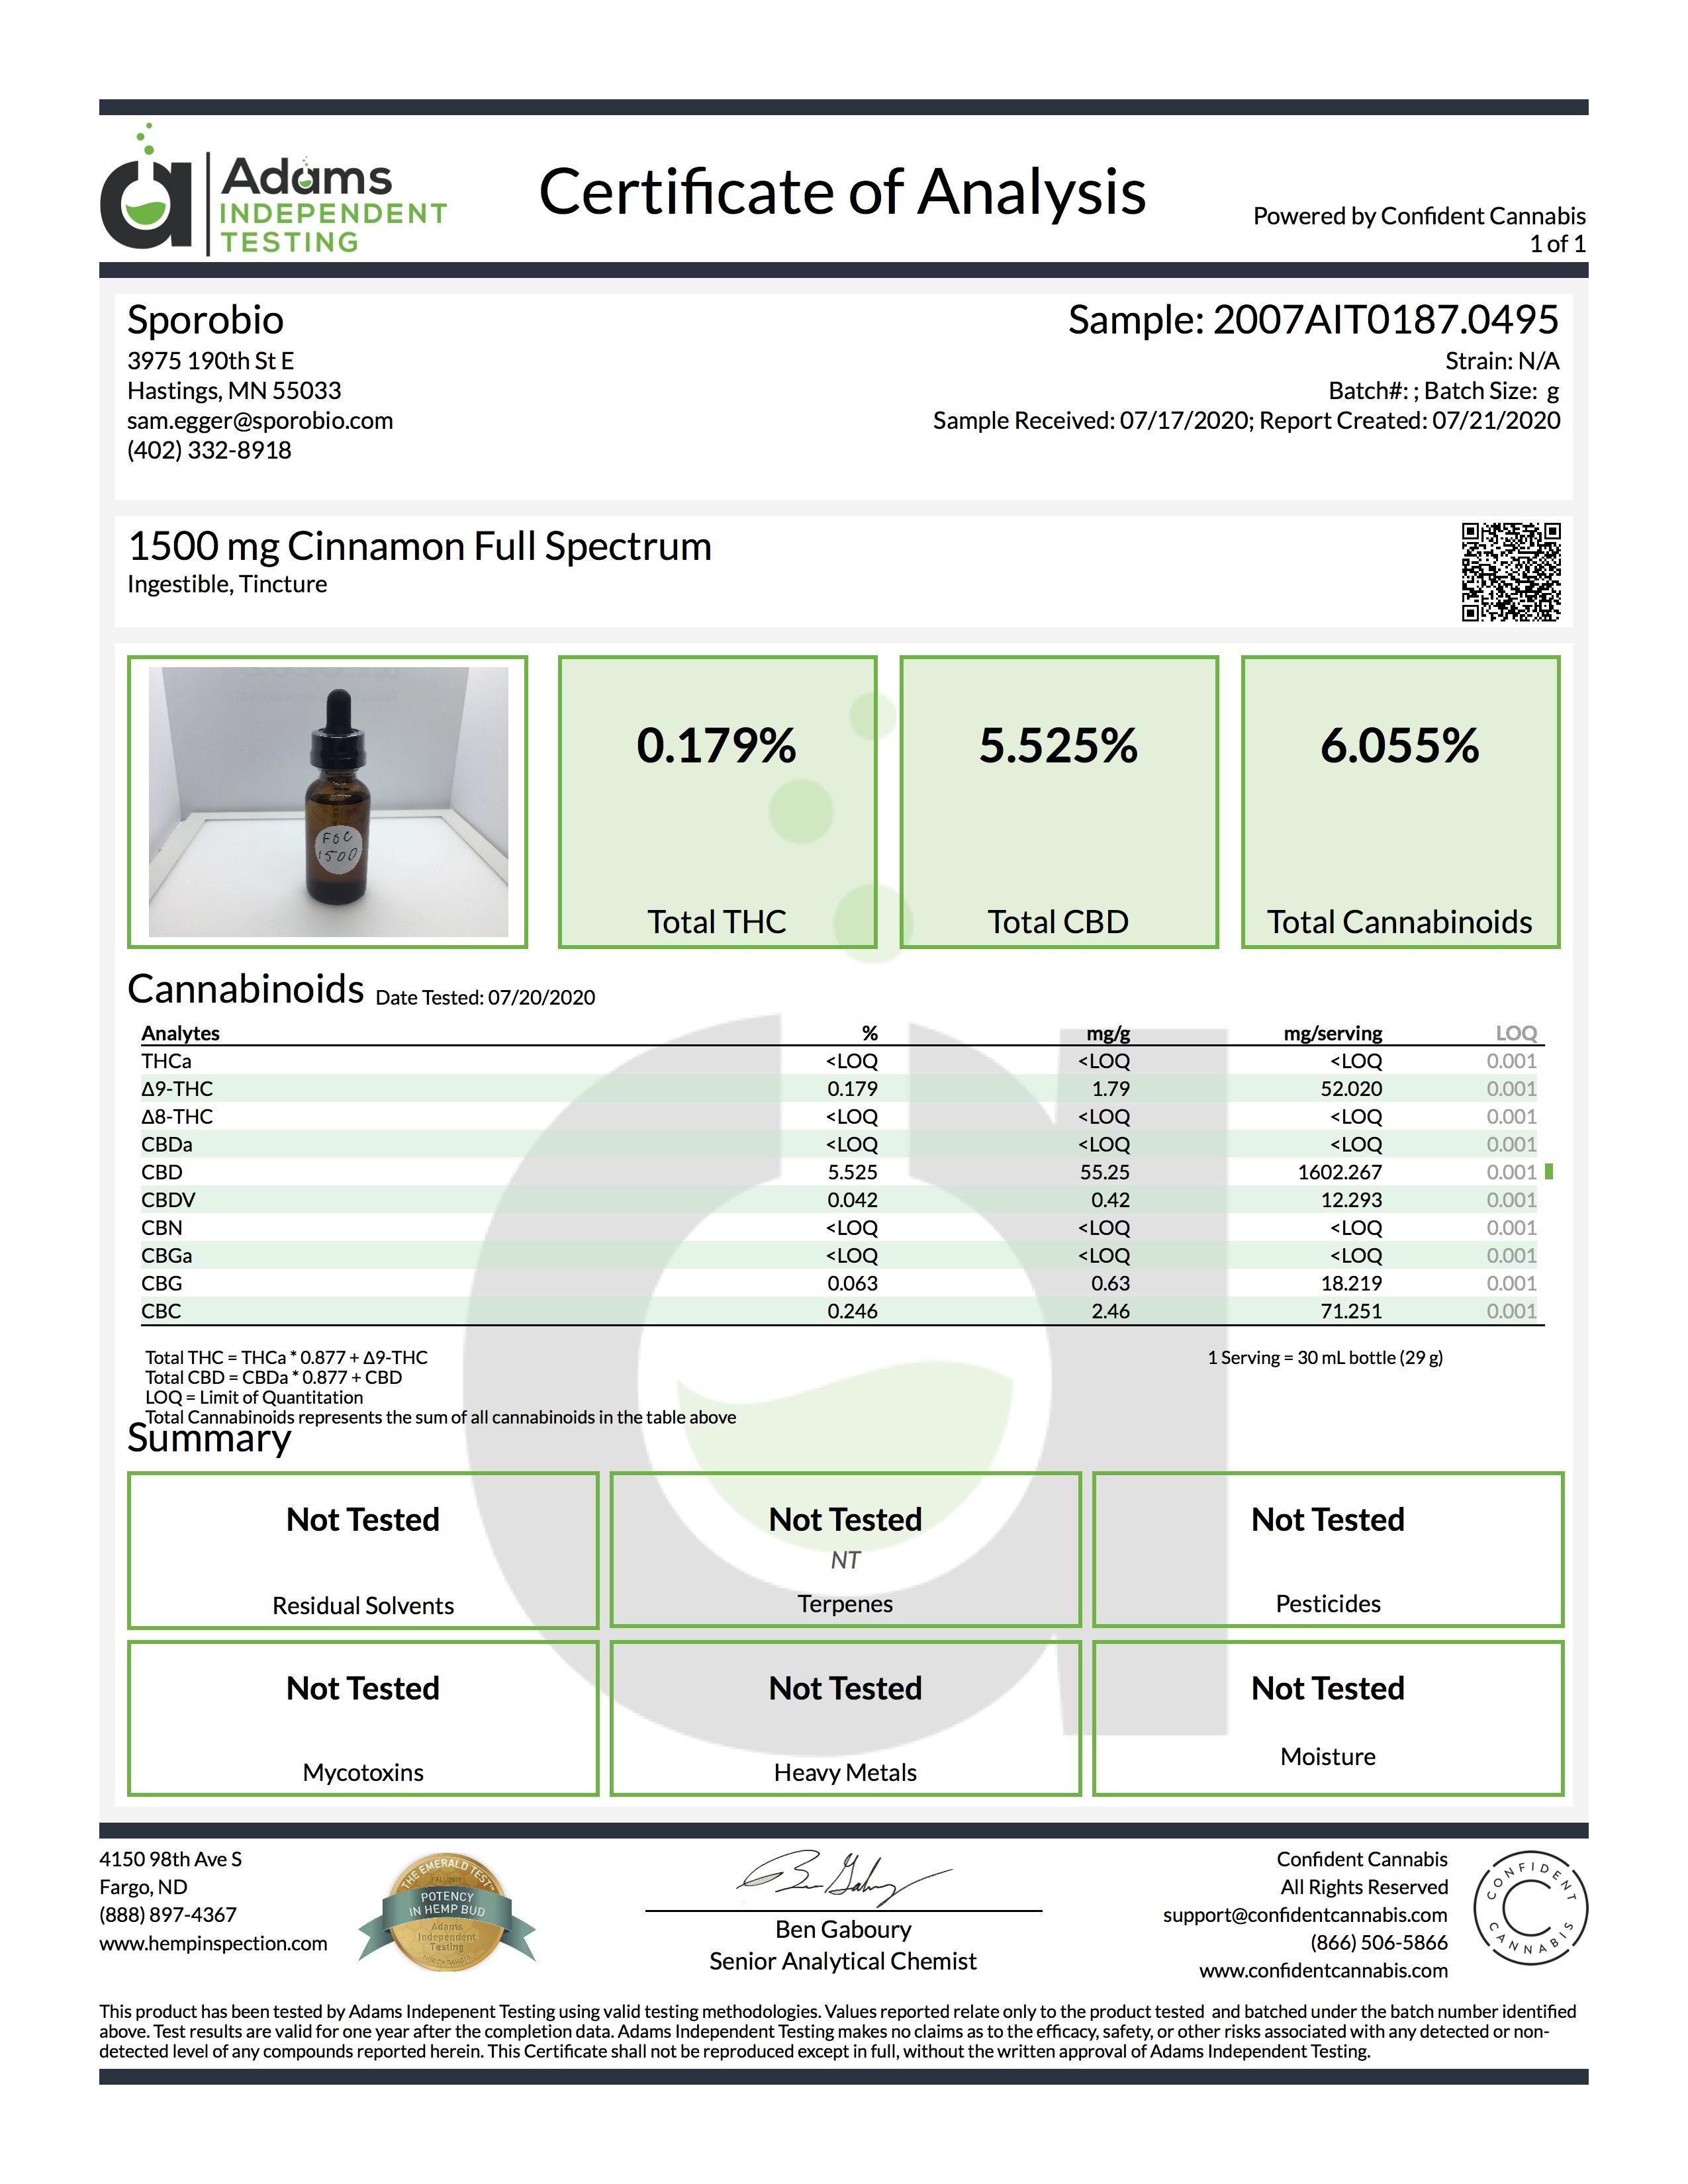 full-spectrum-1500mg-cinnamon-tincture720.jpg